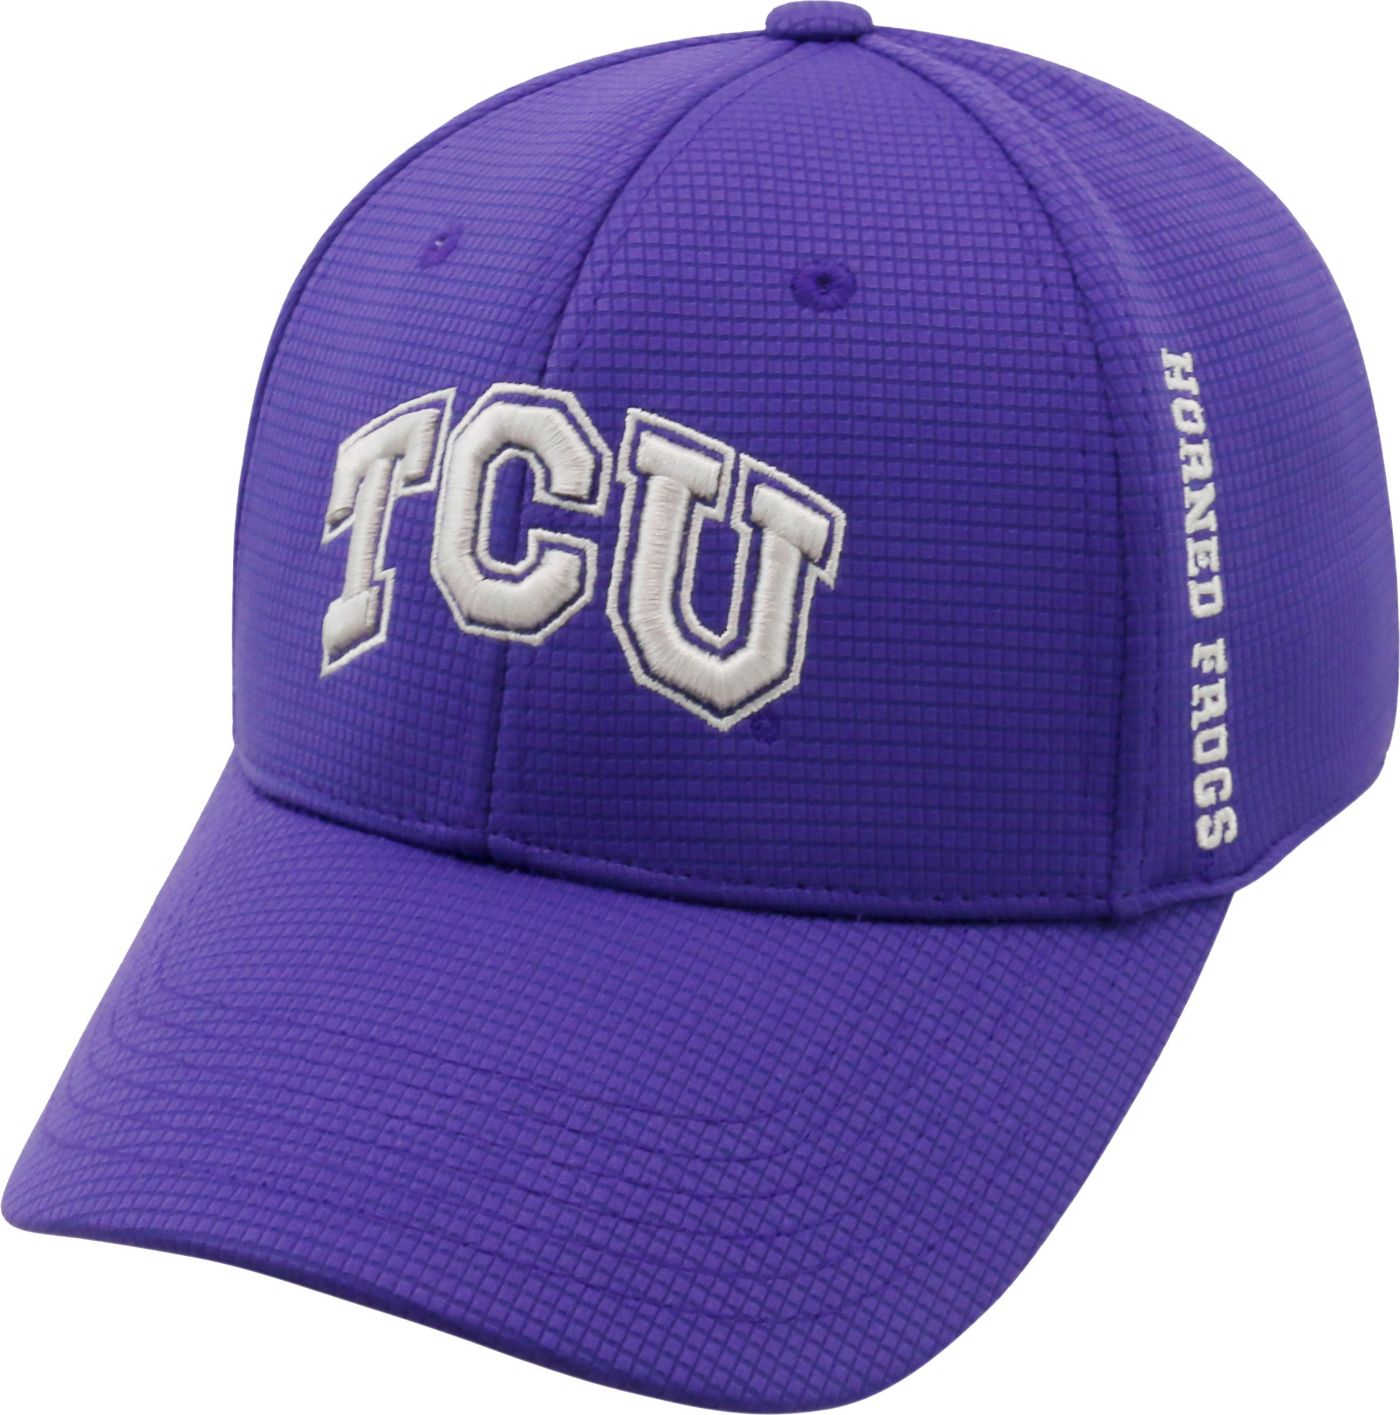 Top of the World Men's TCU Horned Frogs Purple Booster Plus 1Fit Flex Hat